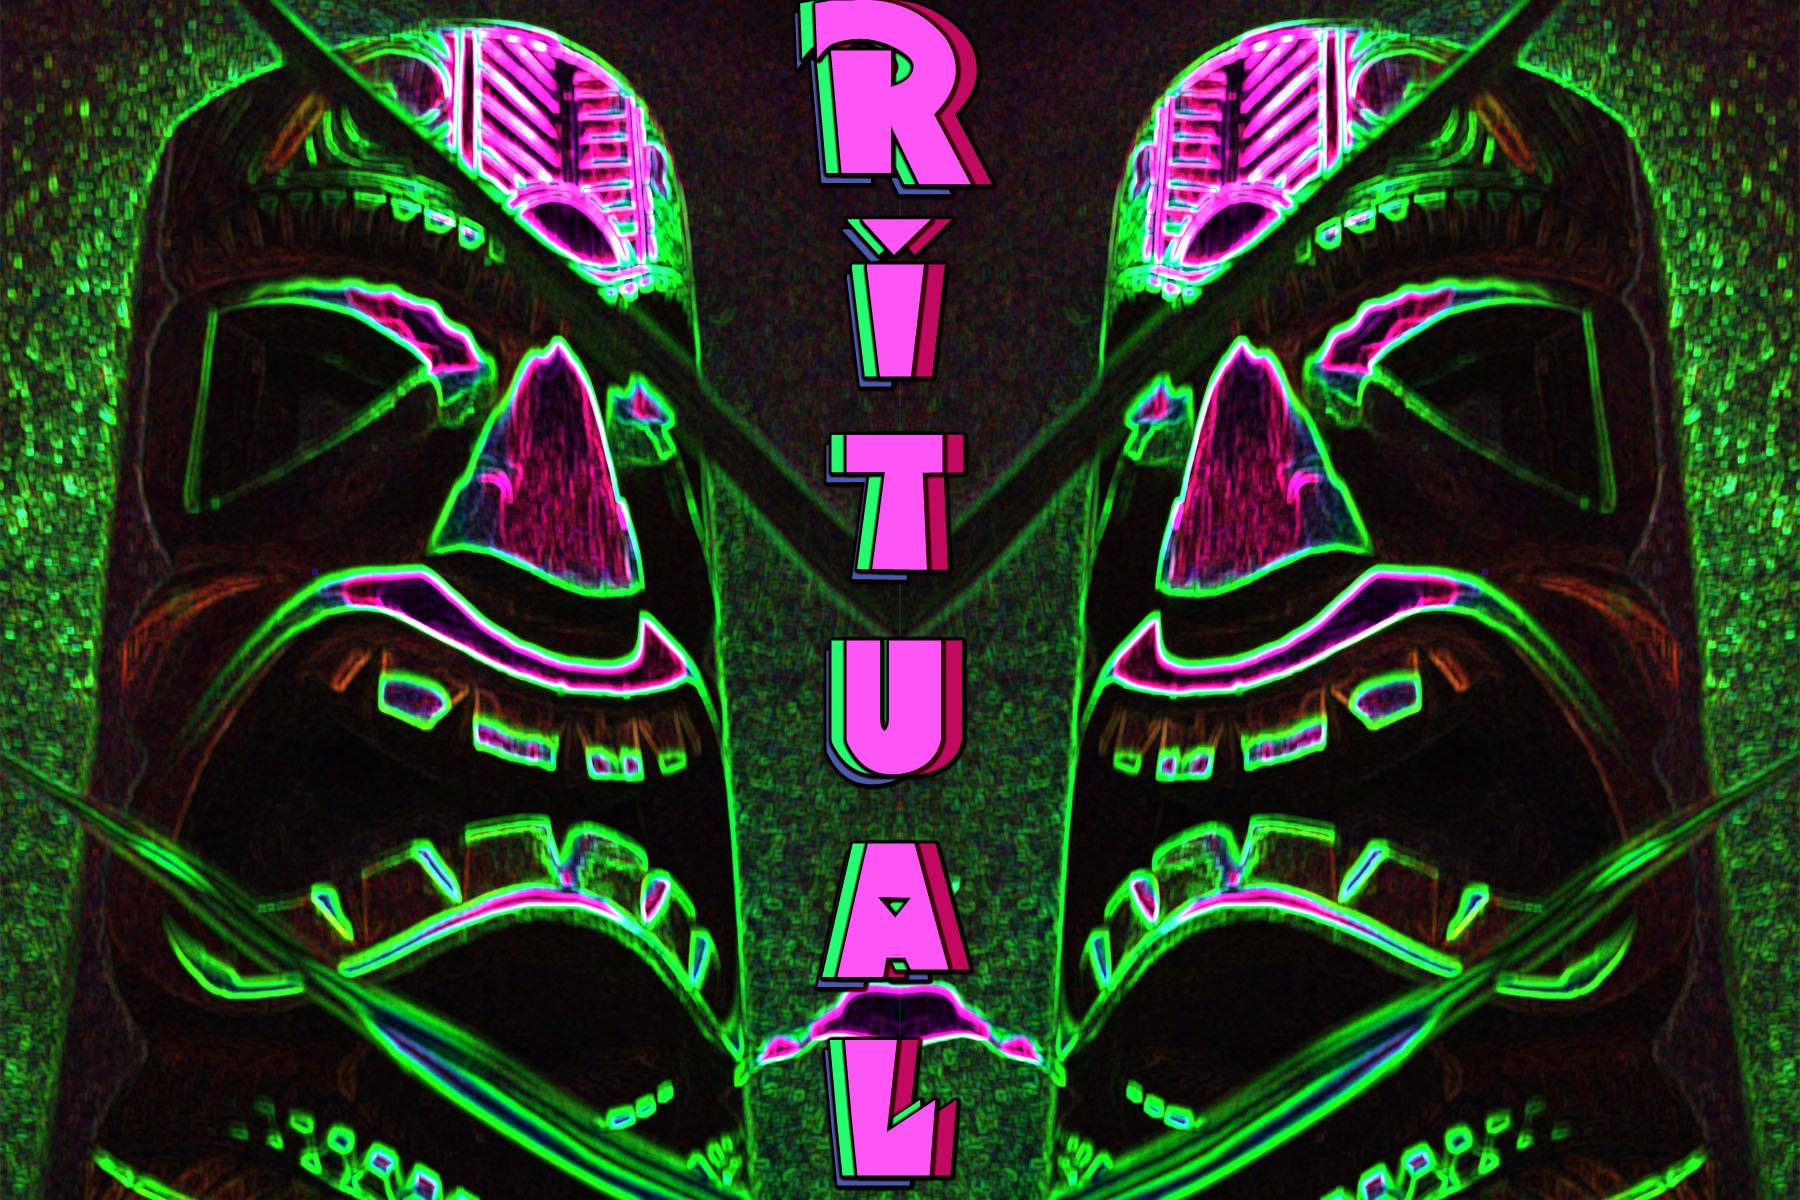 14_Ritual.jpg